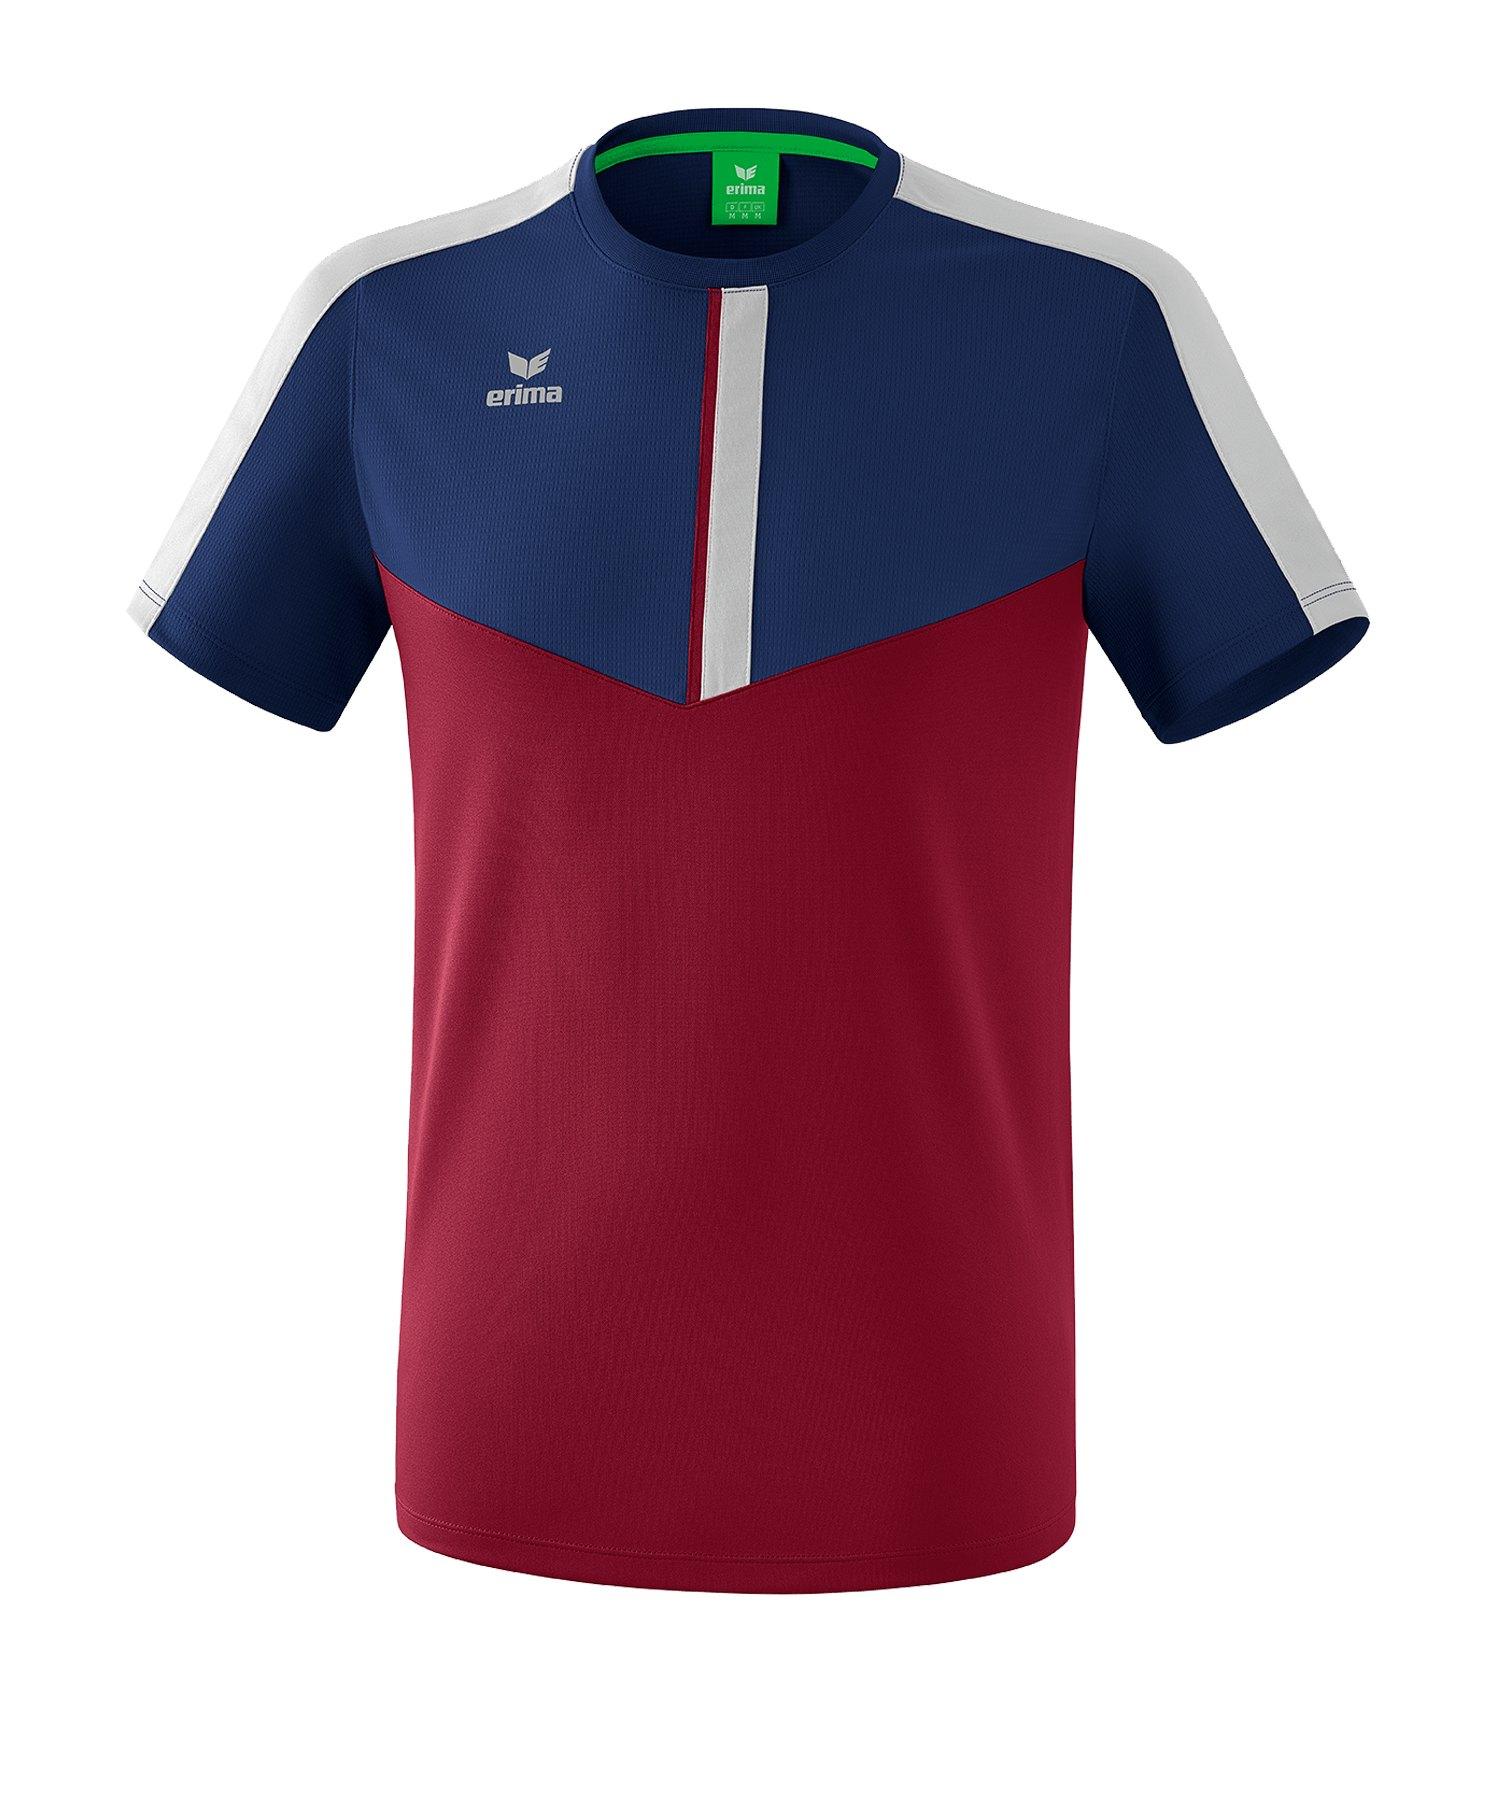 Erima Squad T-Shirt Kids Blau Rot - blau